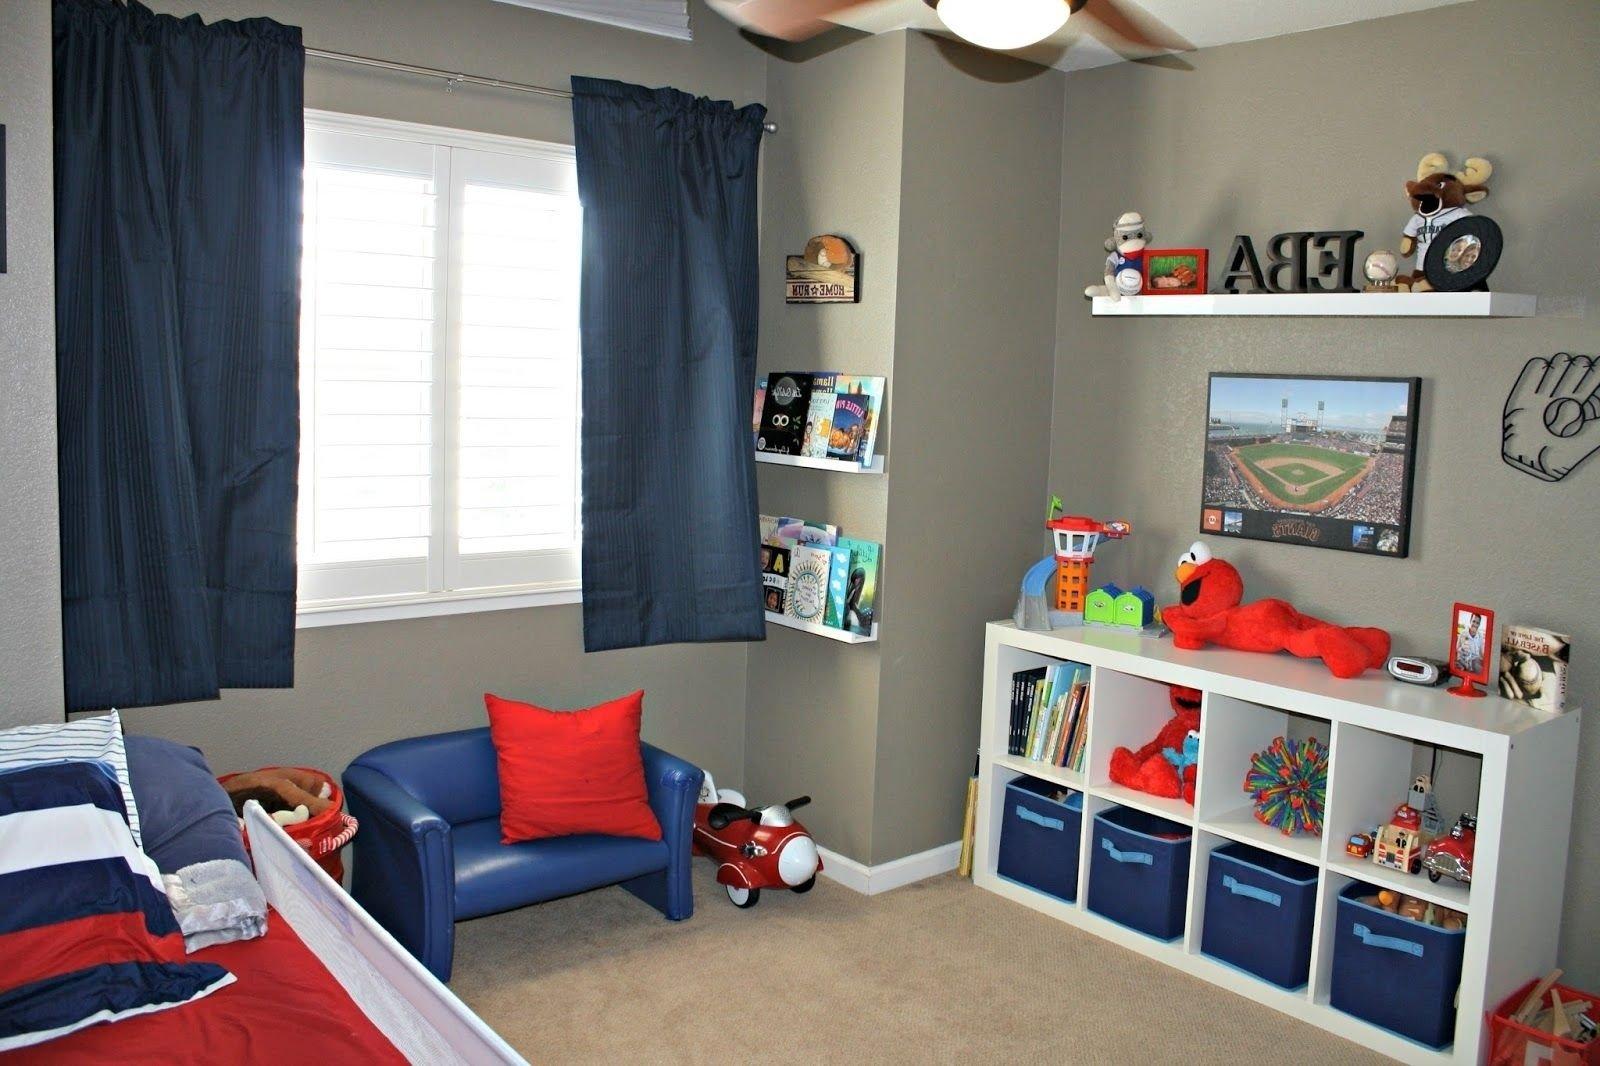 10 Most Popular Ideas For A Boys Room bedroom for a kindergartner boys room pinterest bedrooms 2020